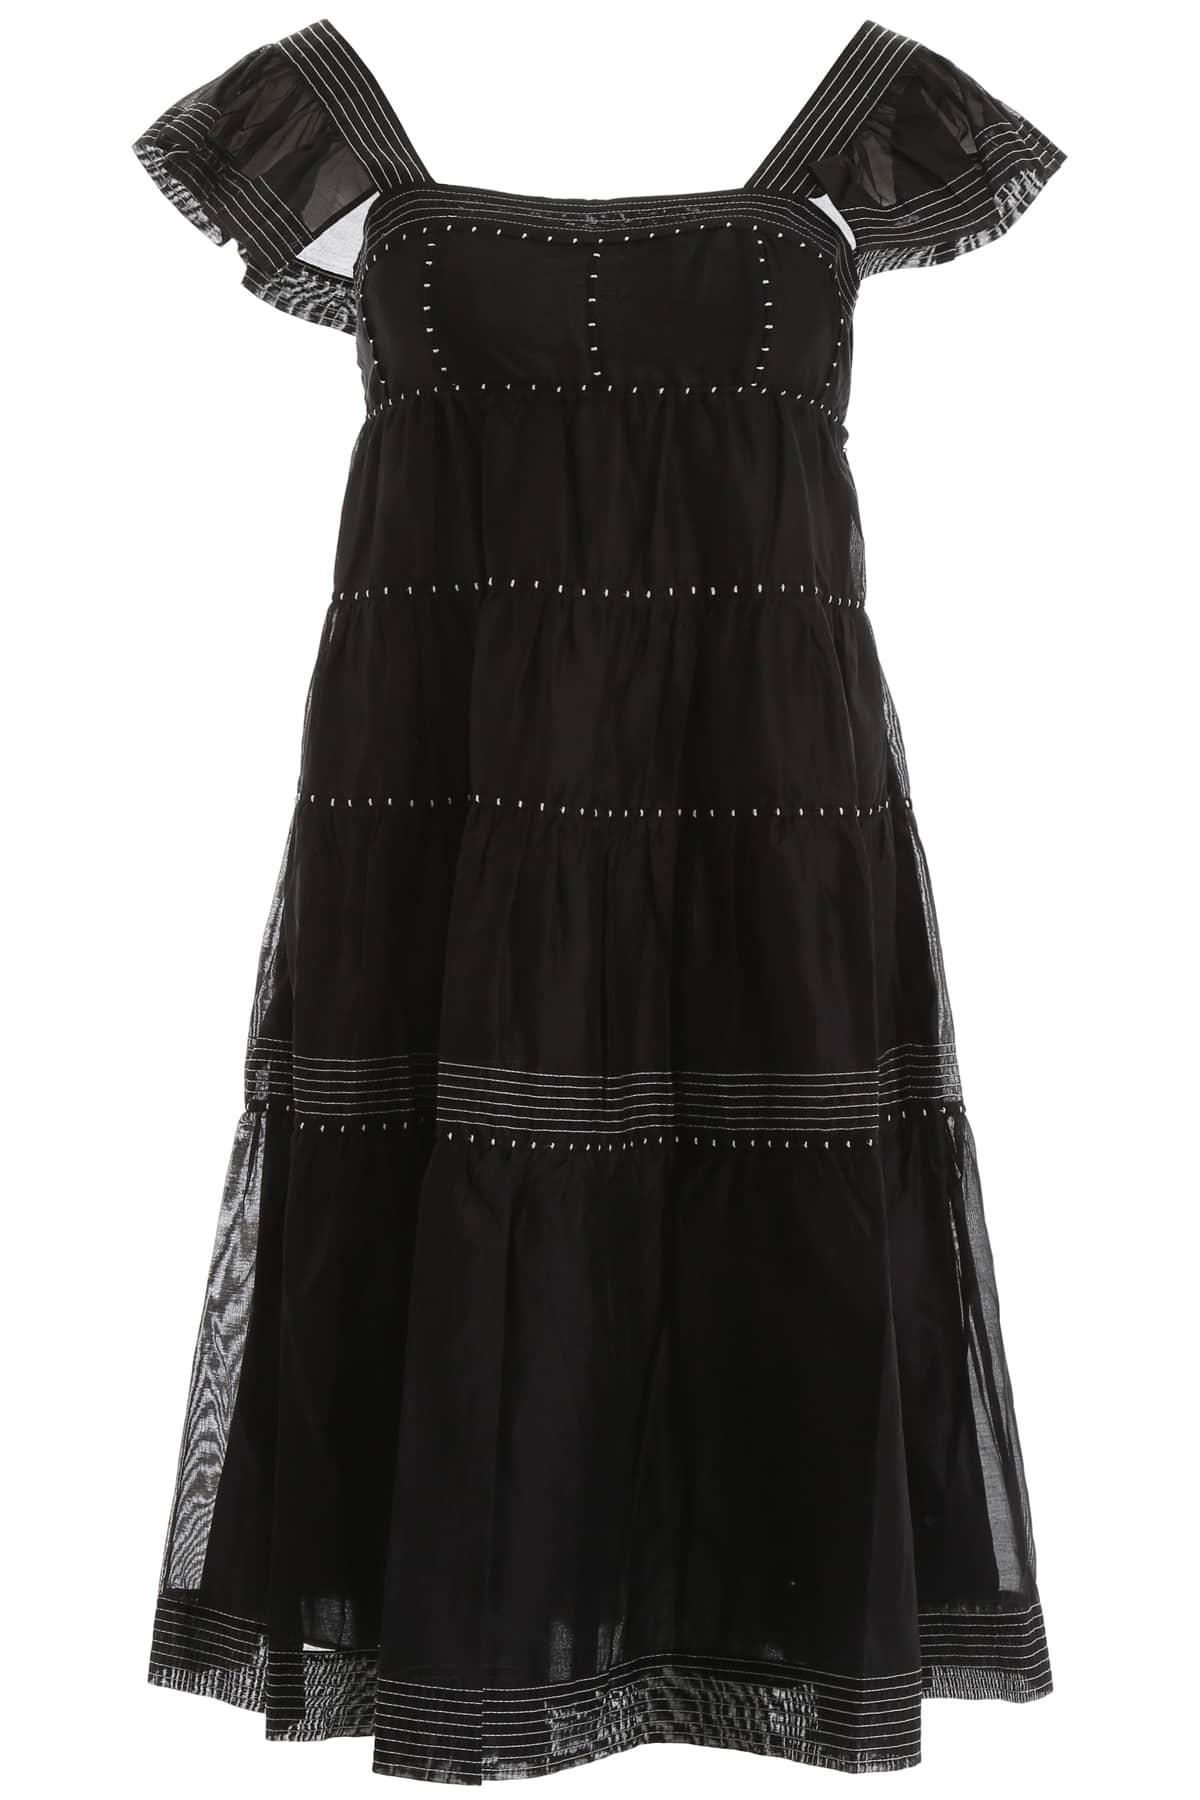 ULLA JOHNSON ROSALIE MIDI DRESS 2 Black Cotton